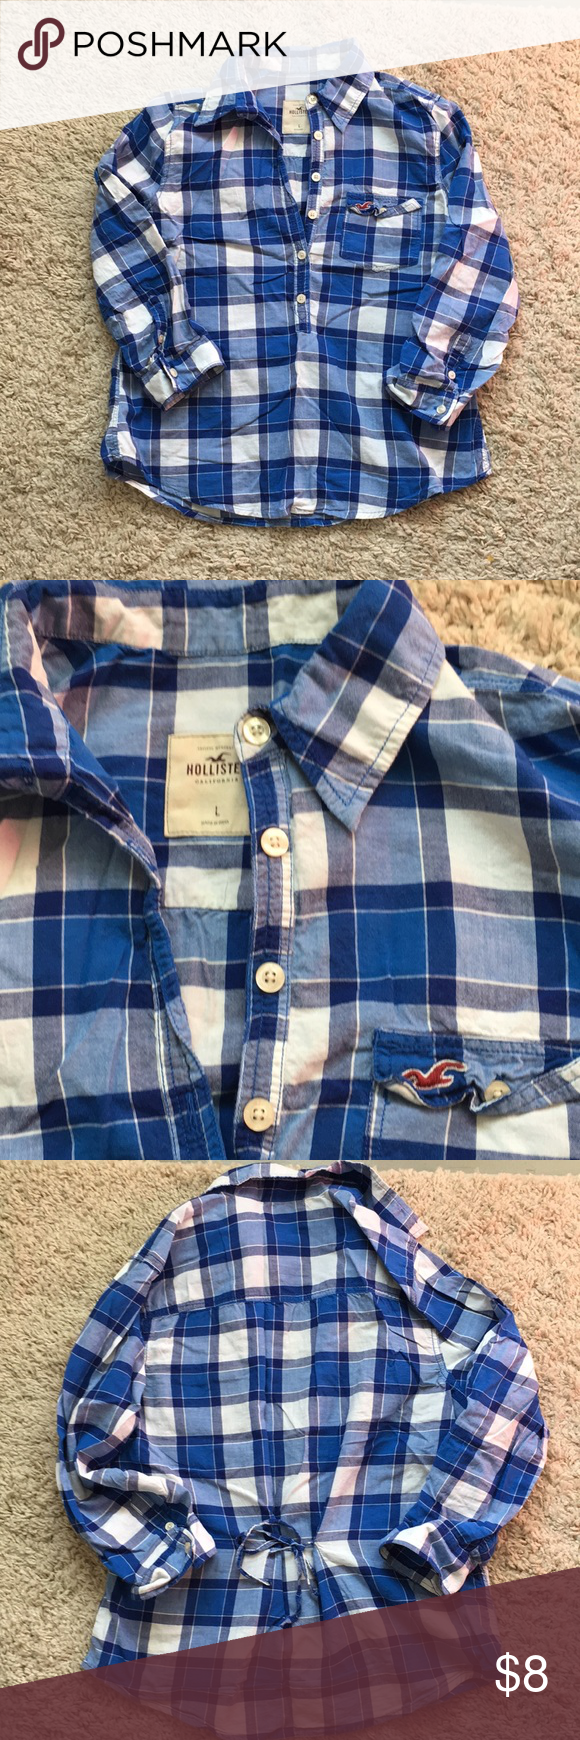 Hollister flannel shirts womens  Closet Closing Final Dropuc Hollister plaid shirt  Plaid and